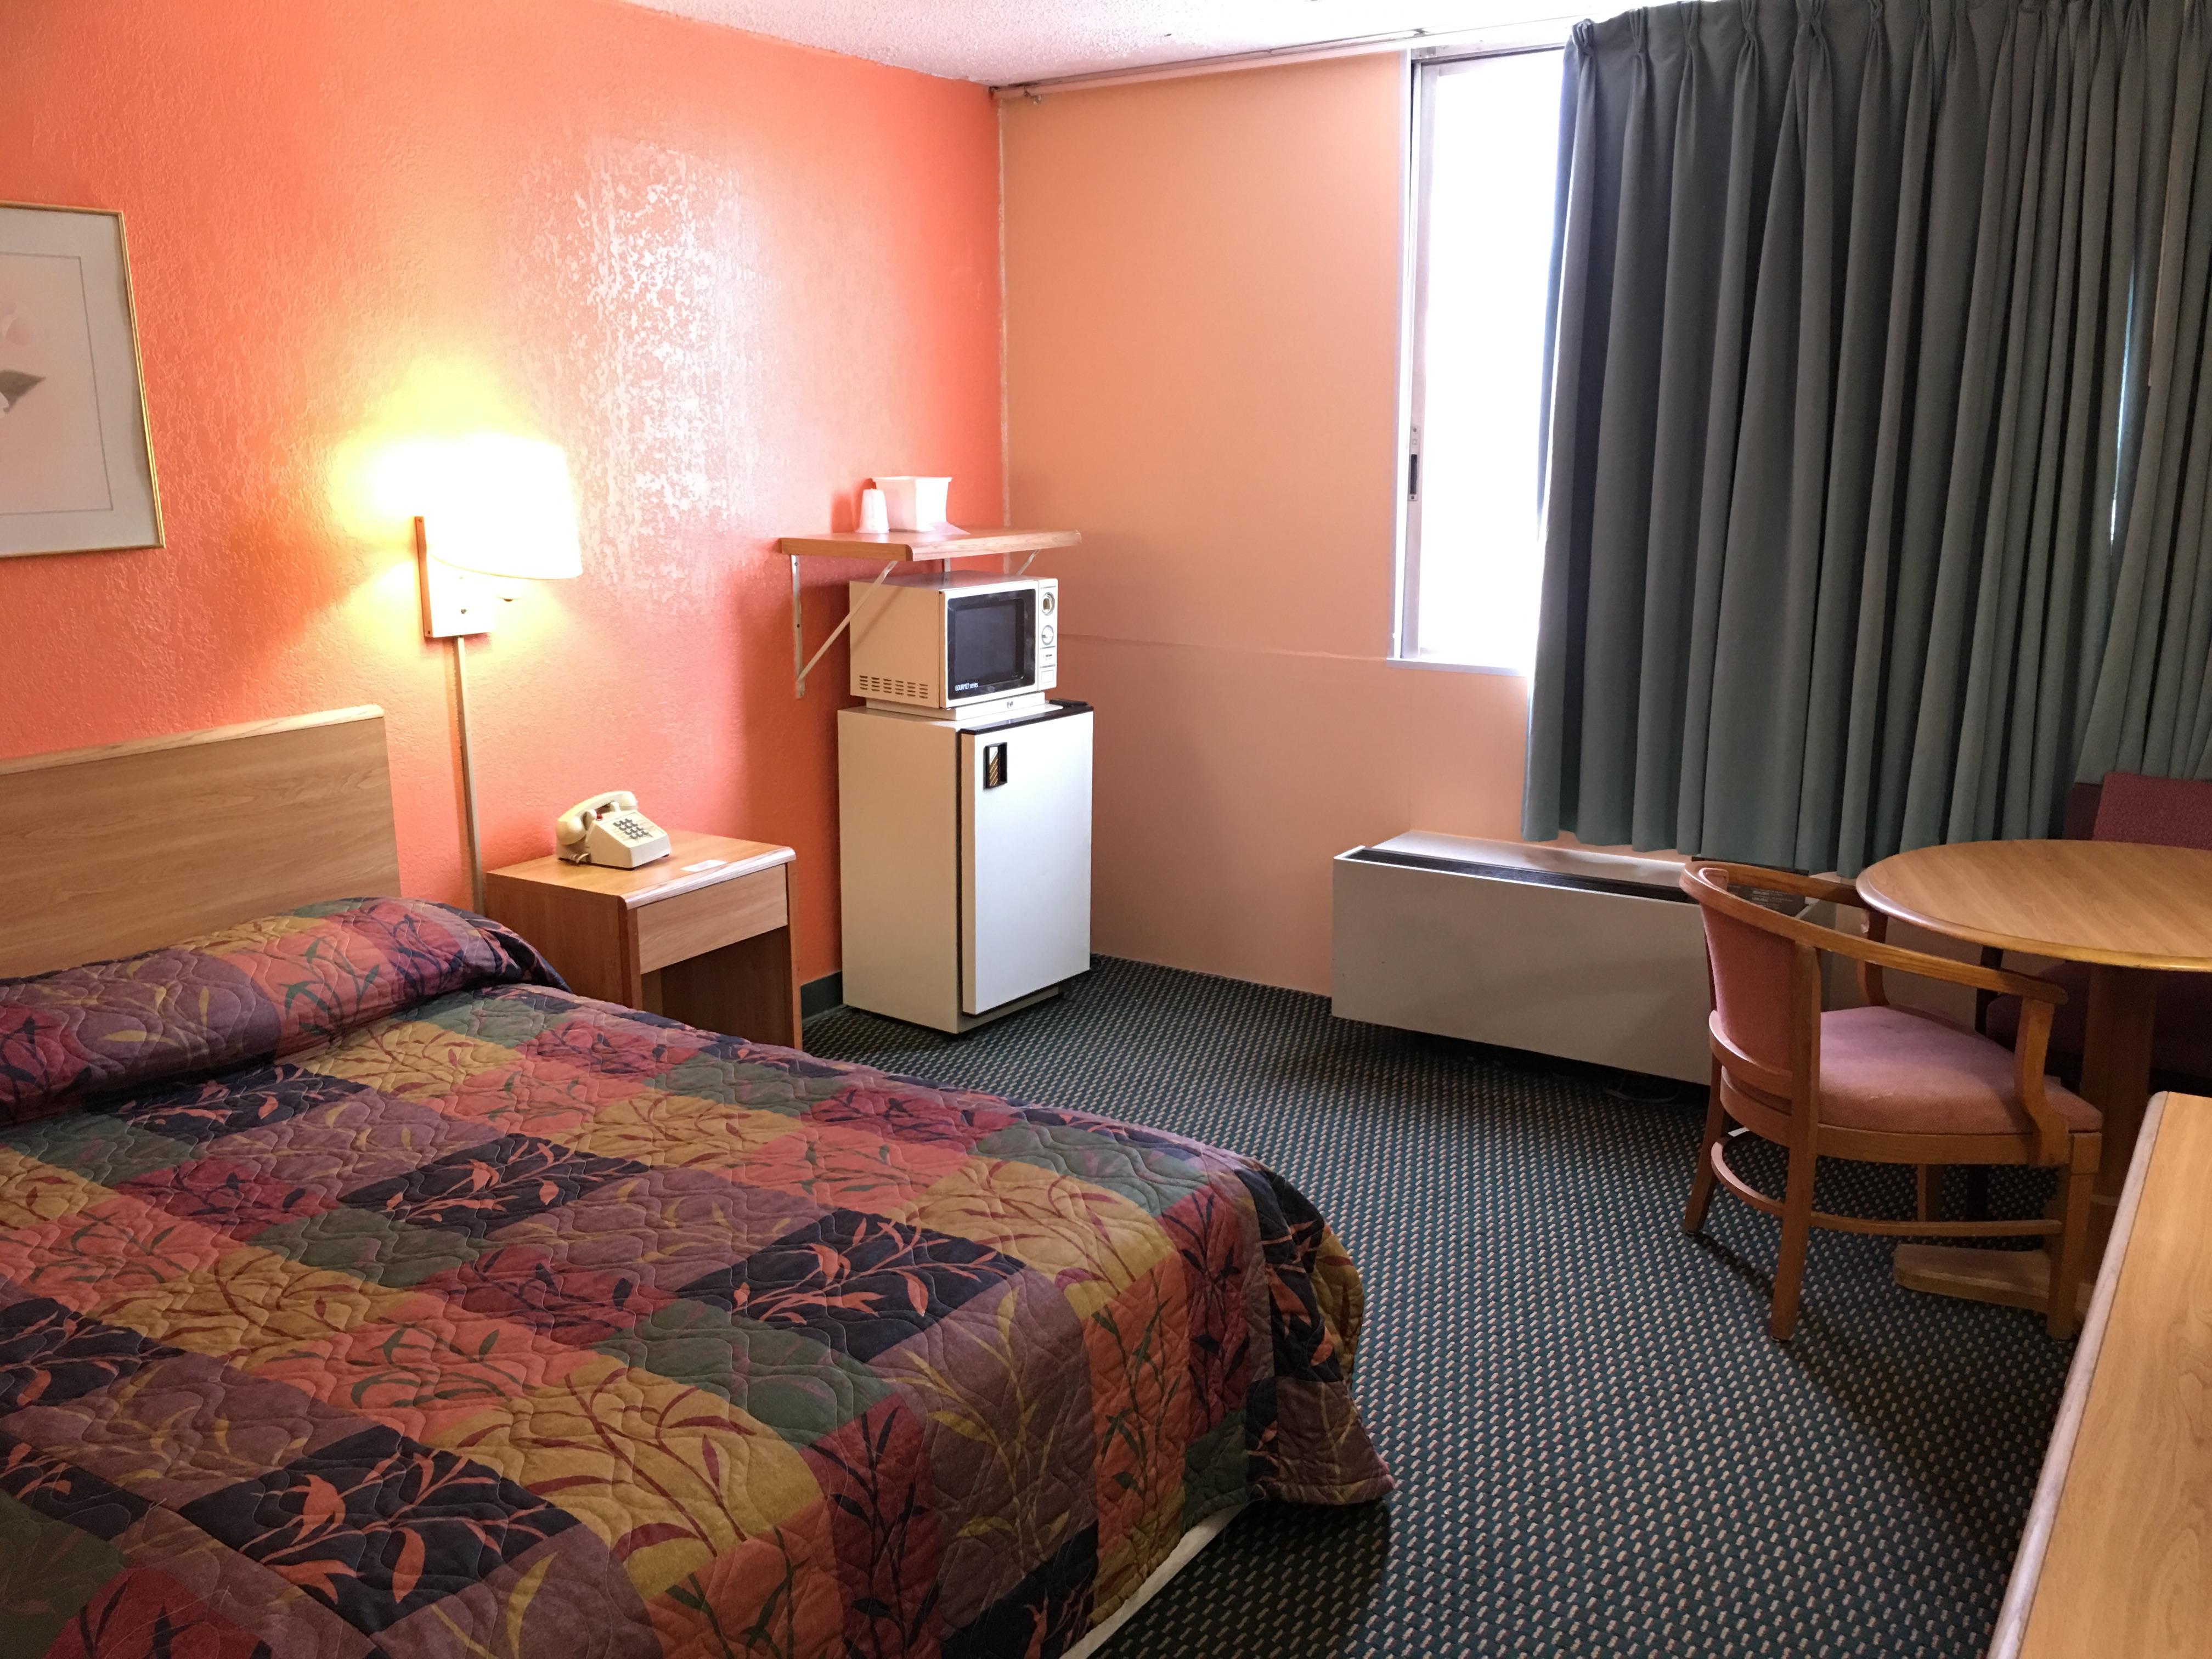 Red Carpet Inn & Suites image 4